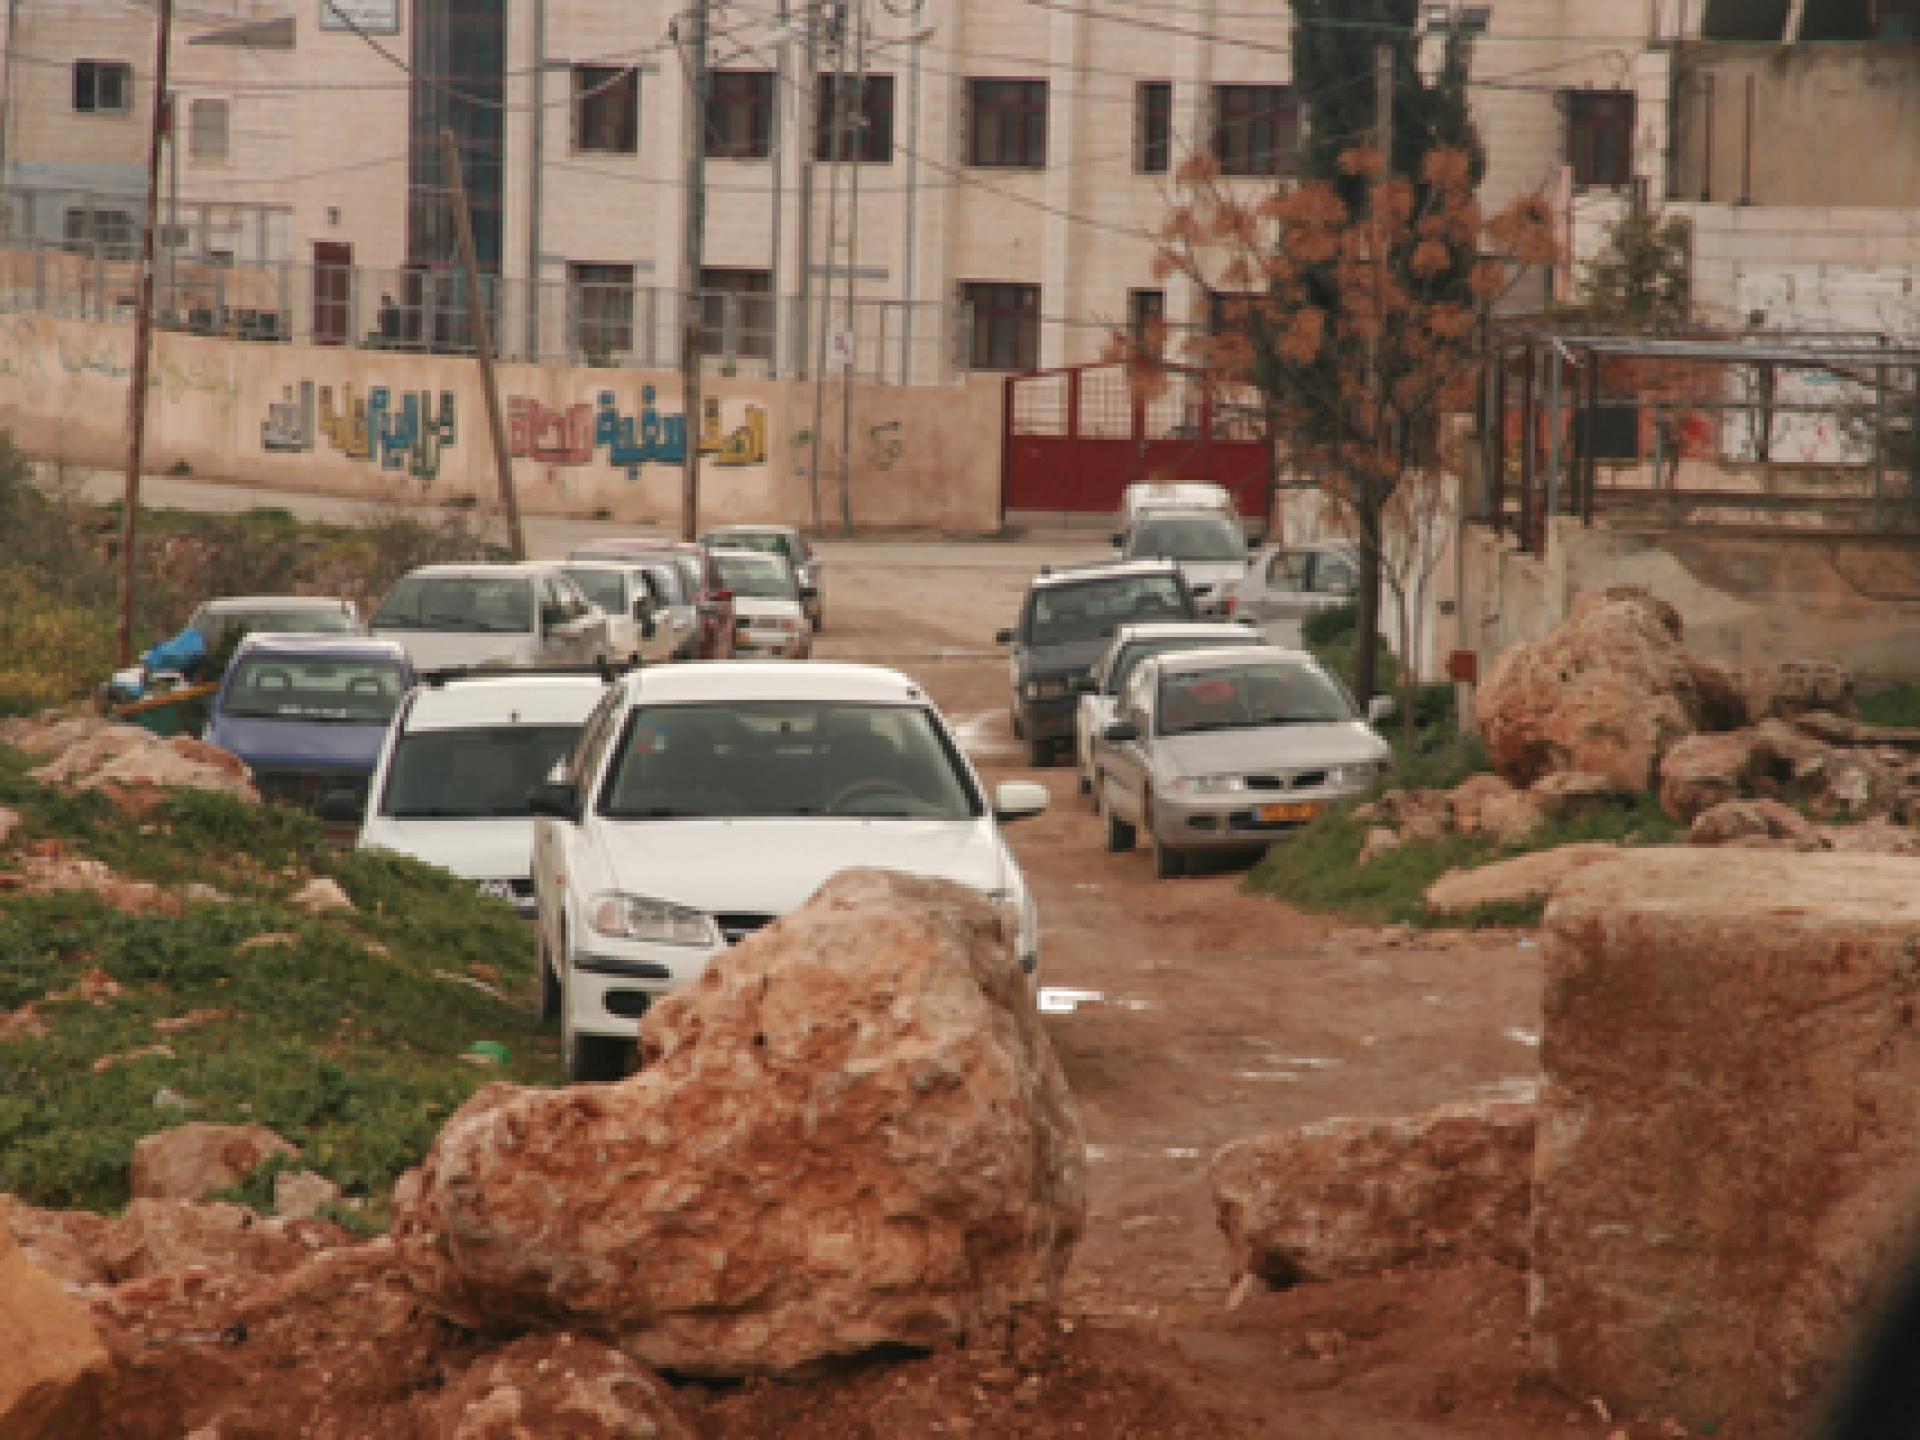 The blocked entrance to Qliqalis